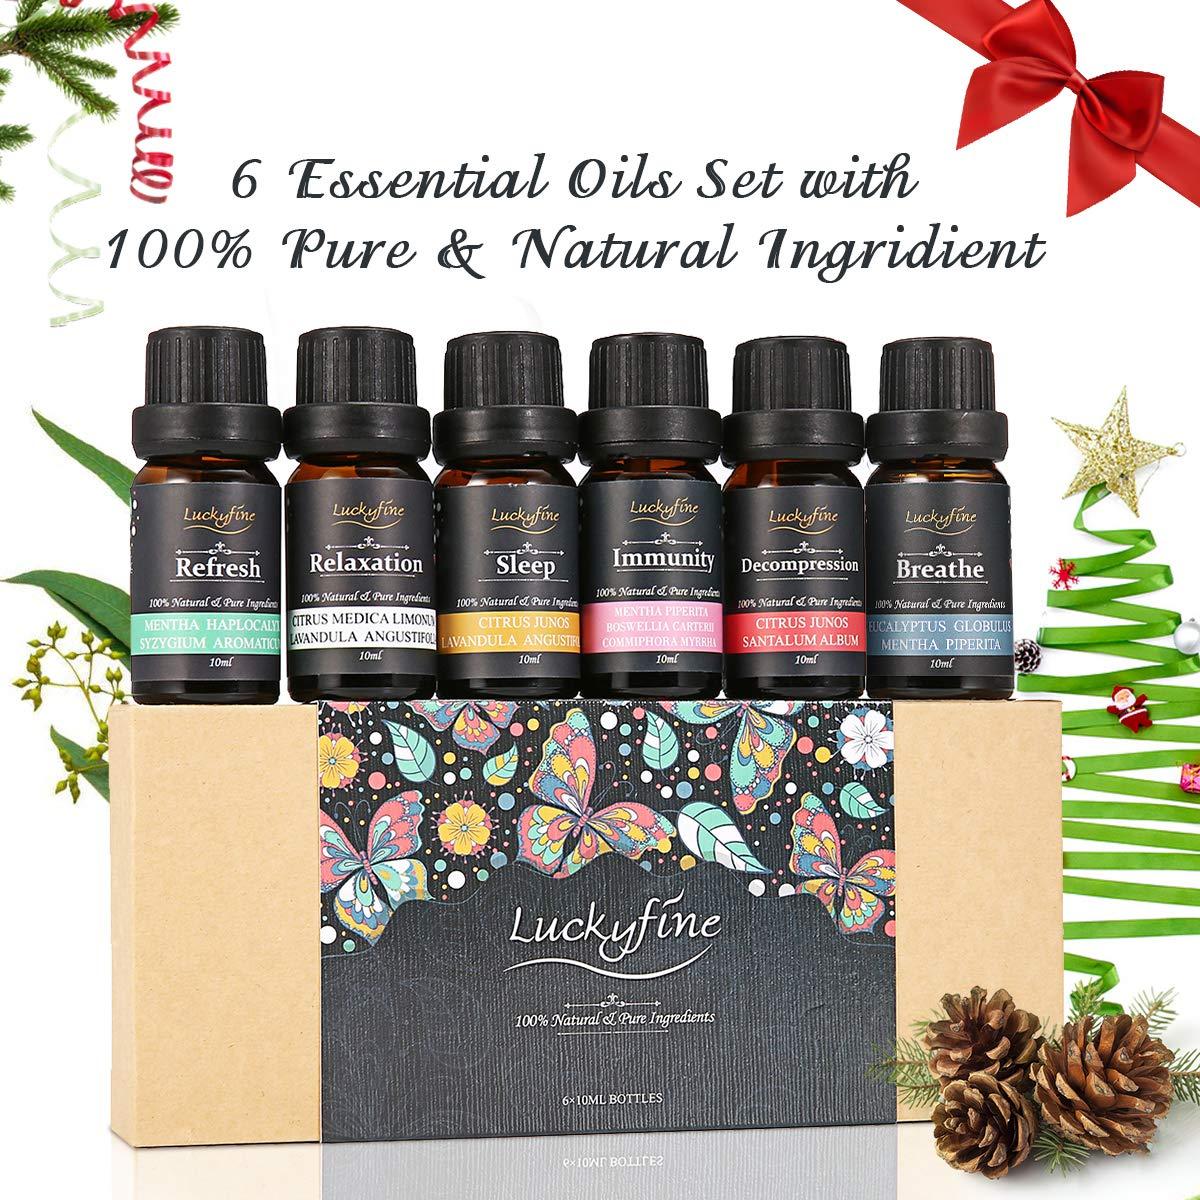 Luckyfine Aceites Esenciales para Humidificador, 100% Natural, Perfume de Aromaterapia - Ayuda a Dormir, Calma el Estado de Ánimo - Regalo Ideal para Todas ...